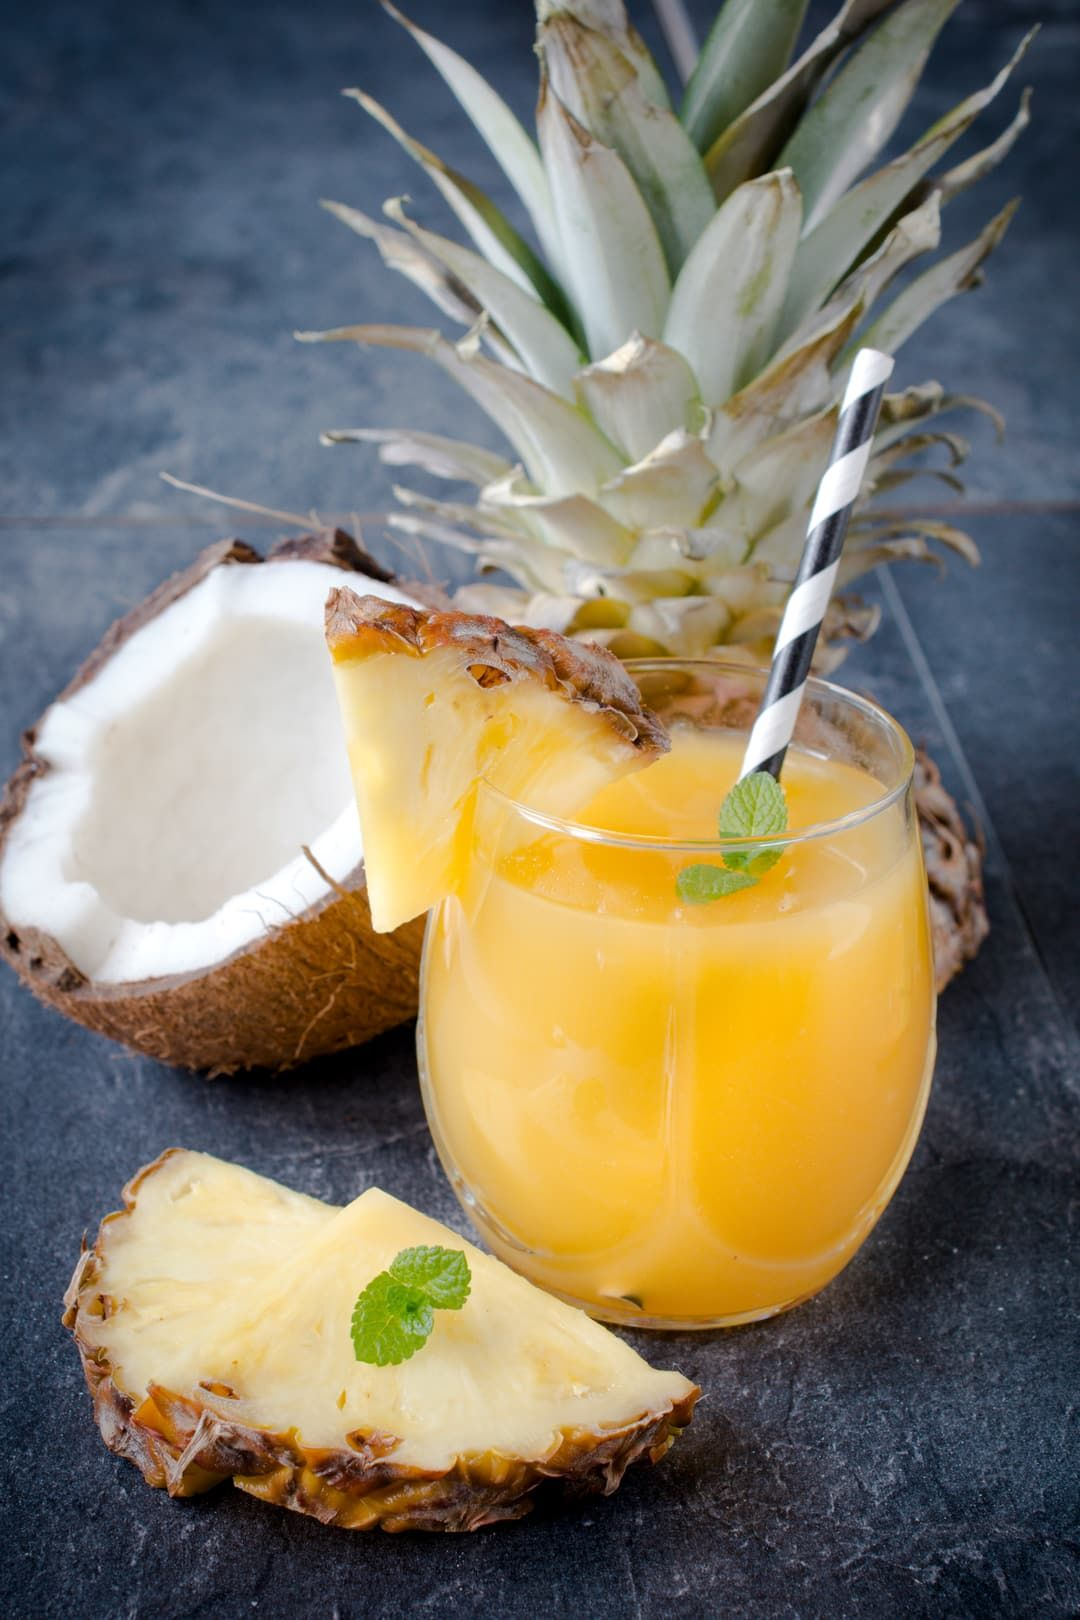 Bromelain Benefits for Skin Care Pineapple cocktail